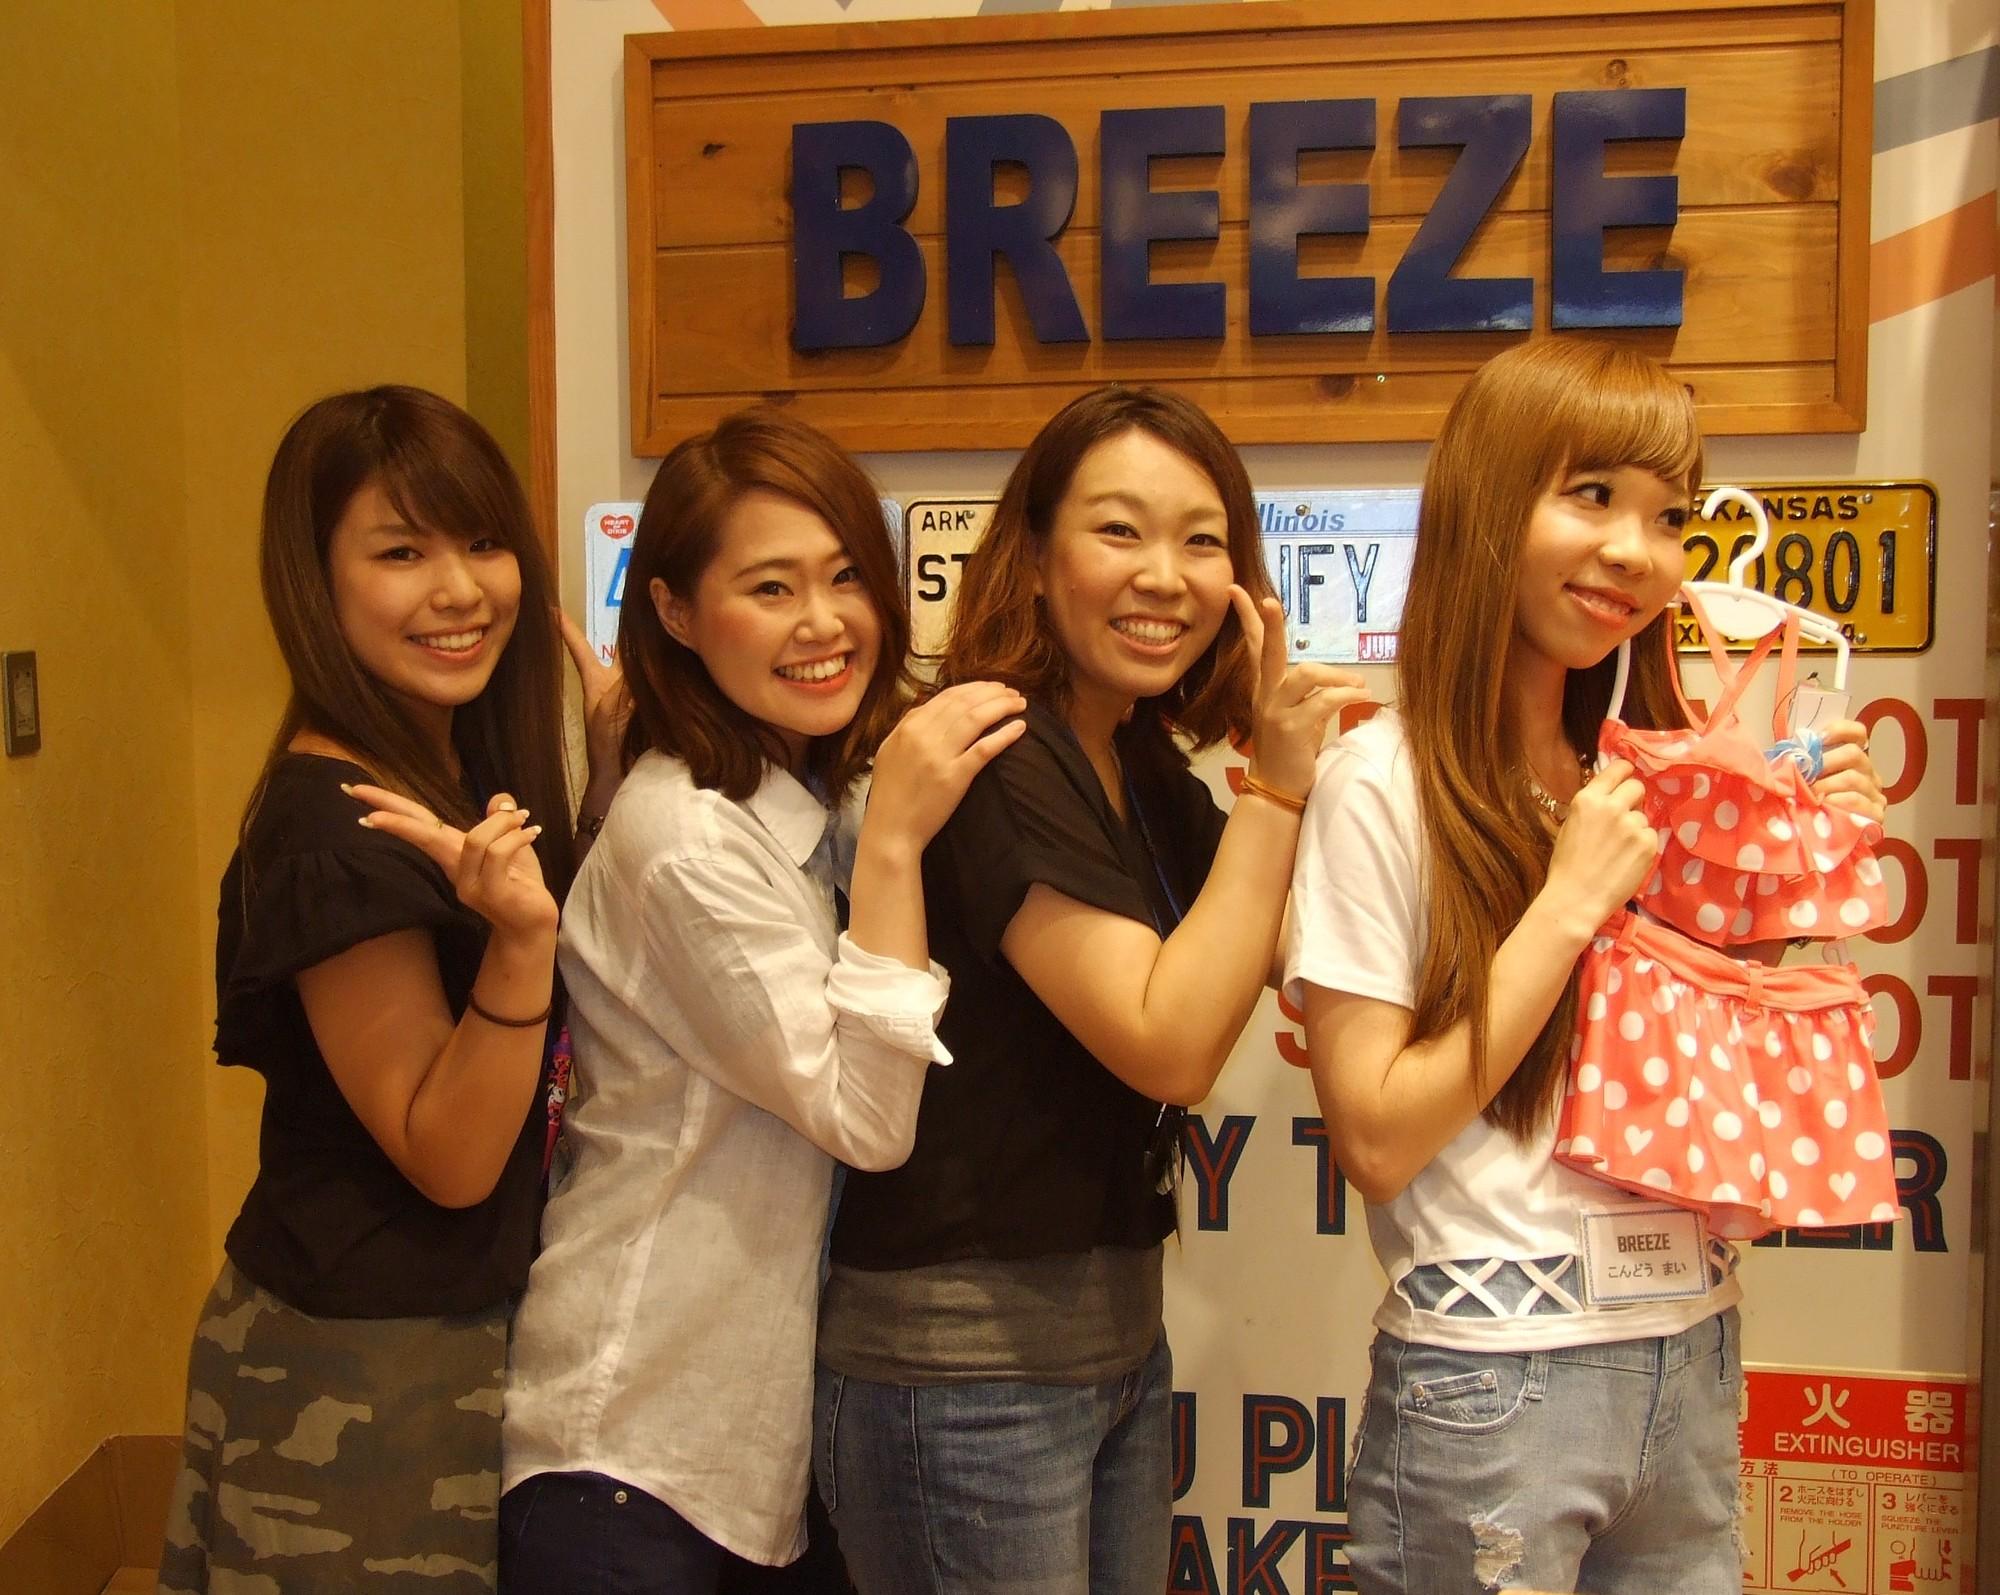 BREEZE ららぽーと横浜店